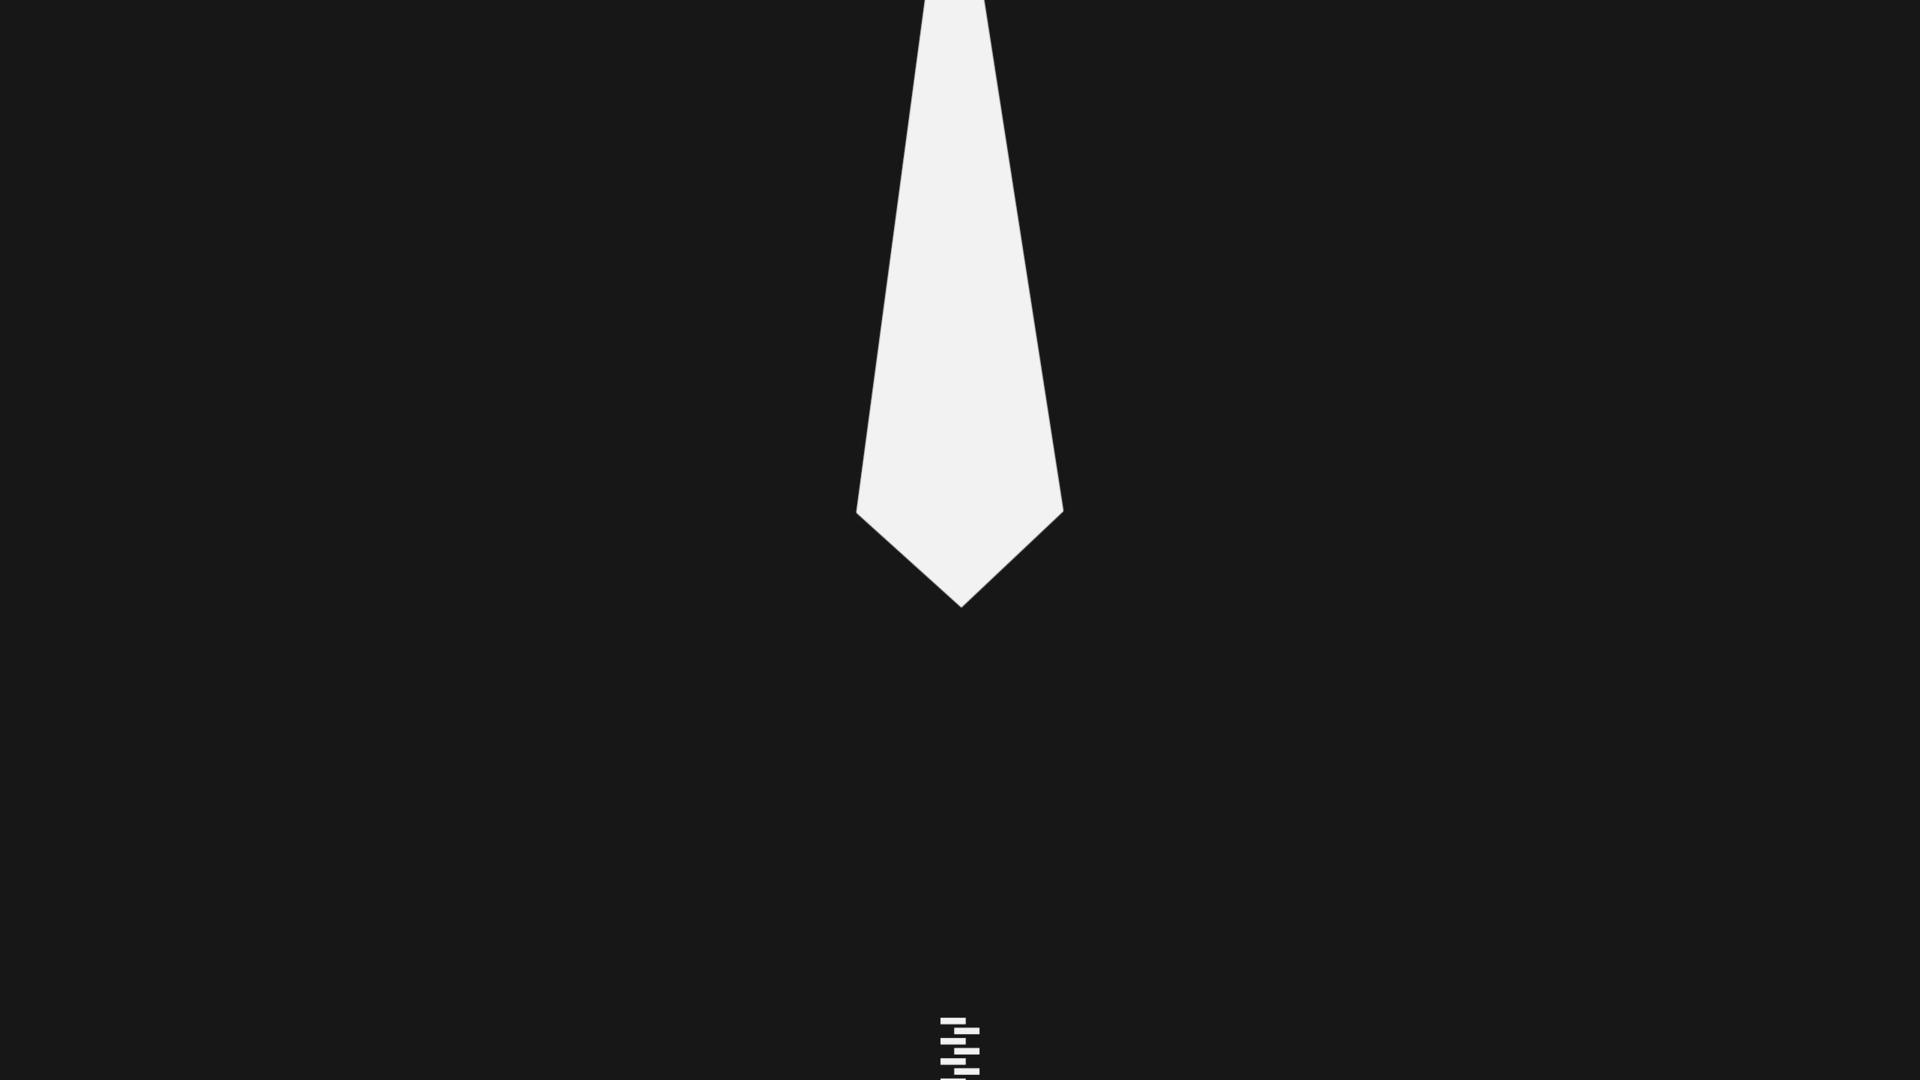 Suit Wallpaper Hd